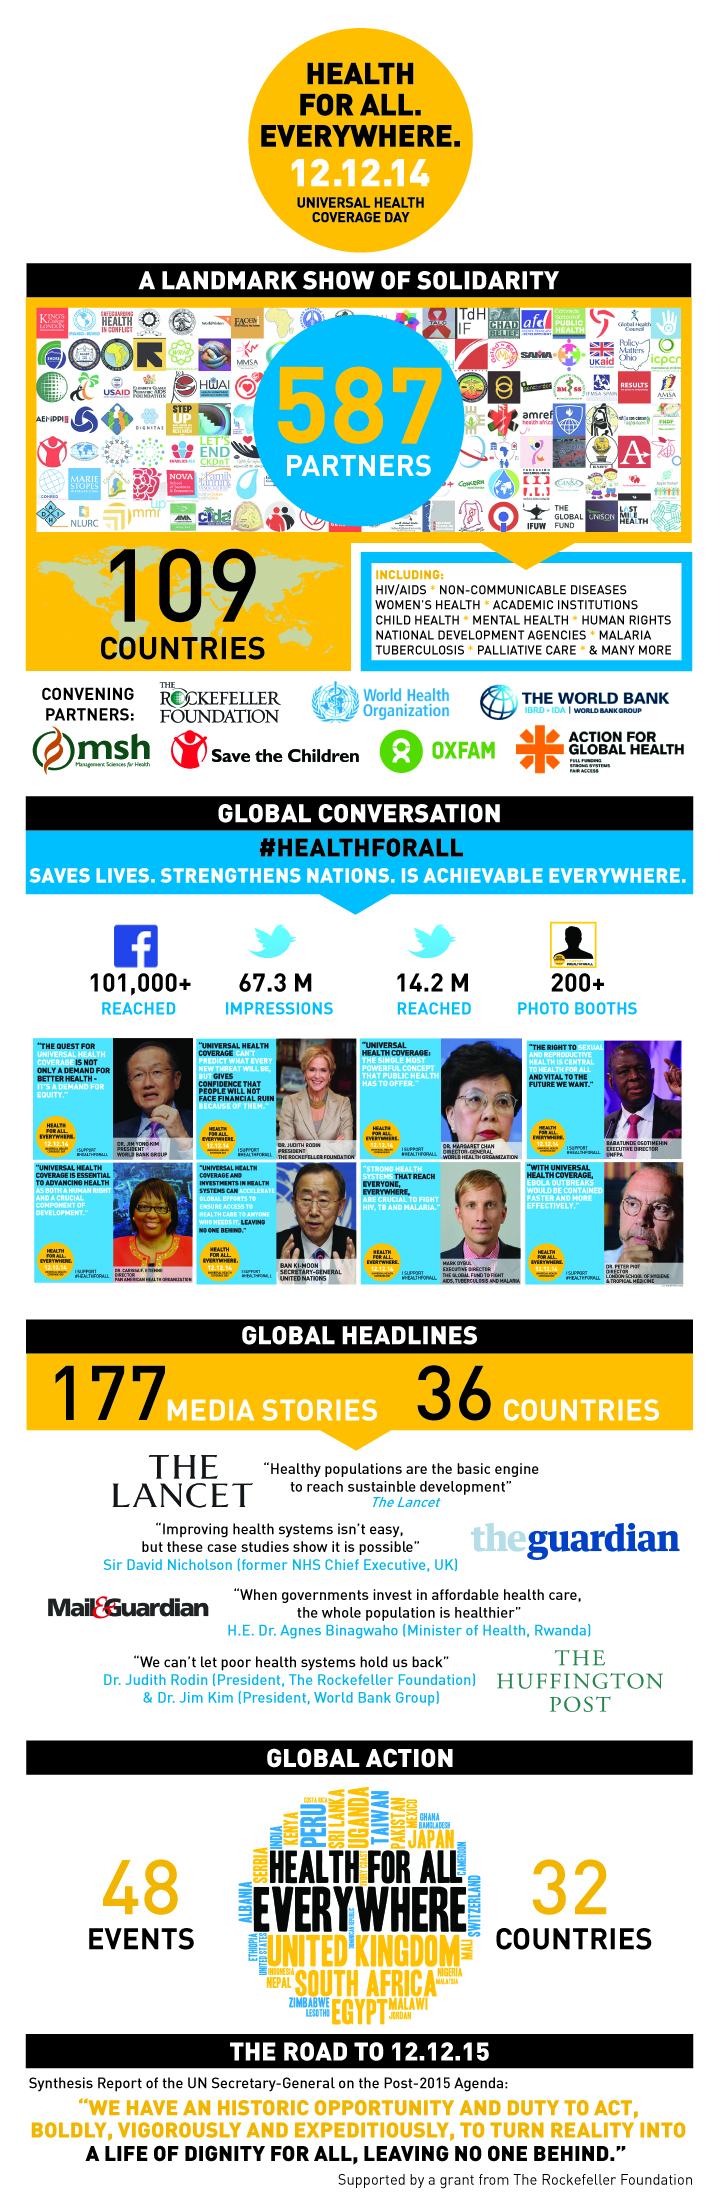 Universal Health Coverage HealthForAll 12 Dec 2014 Infographic